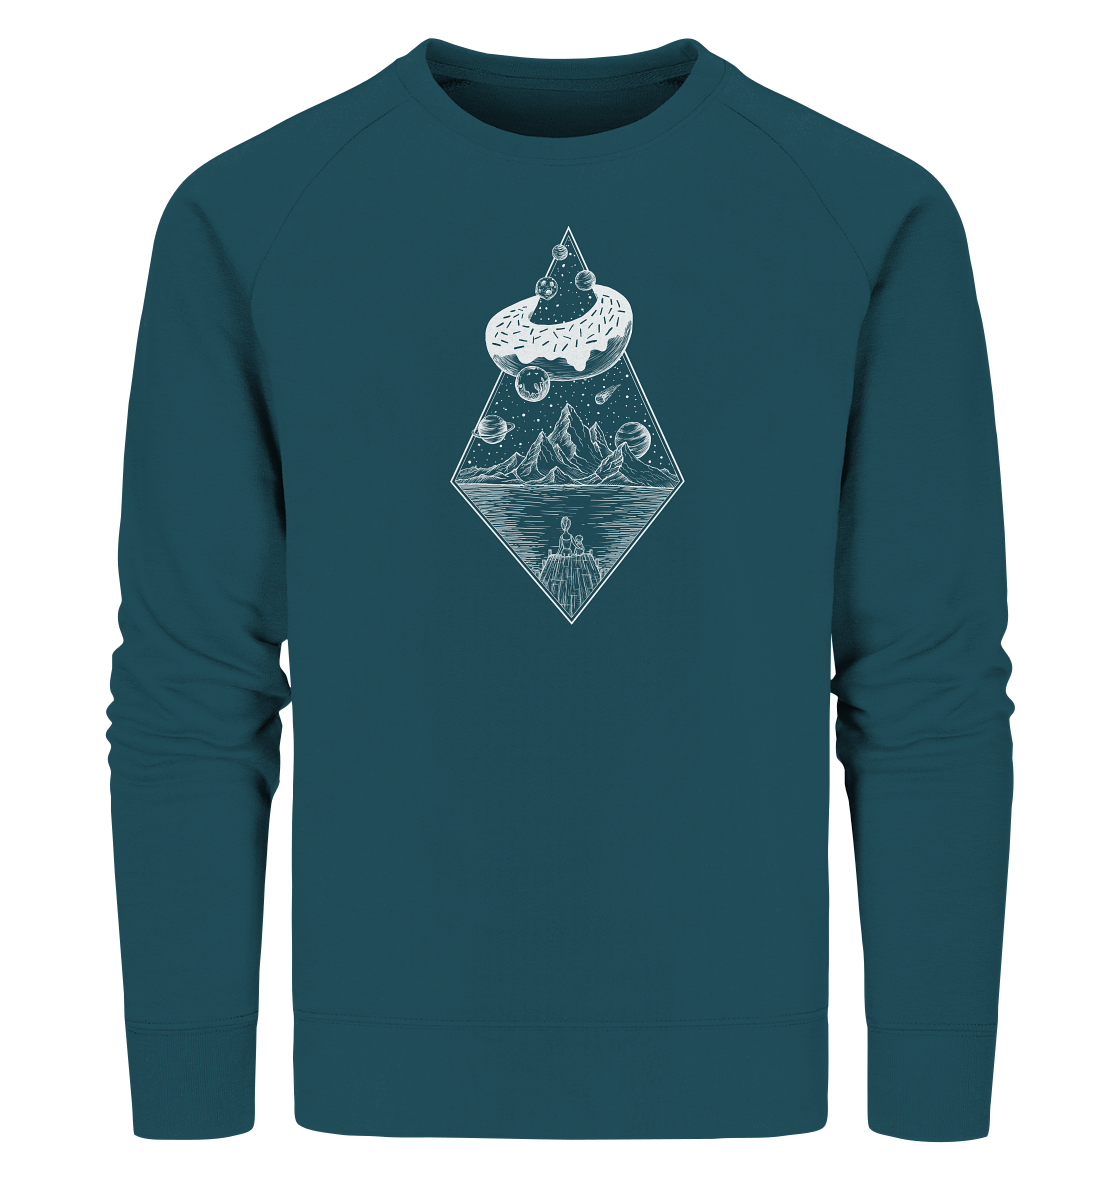 front-organic-sweatshirt-204d59-1116x-1.png